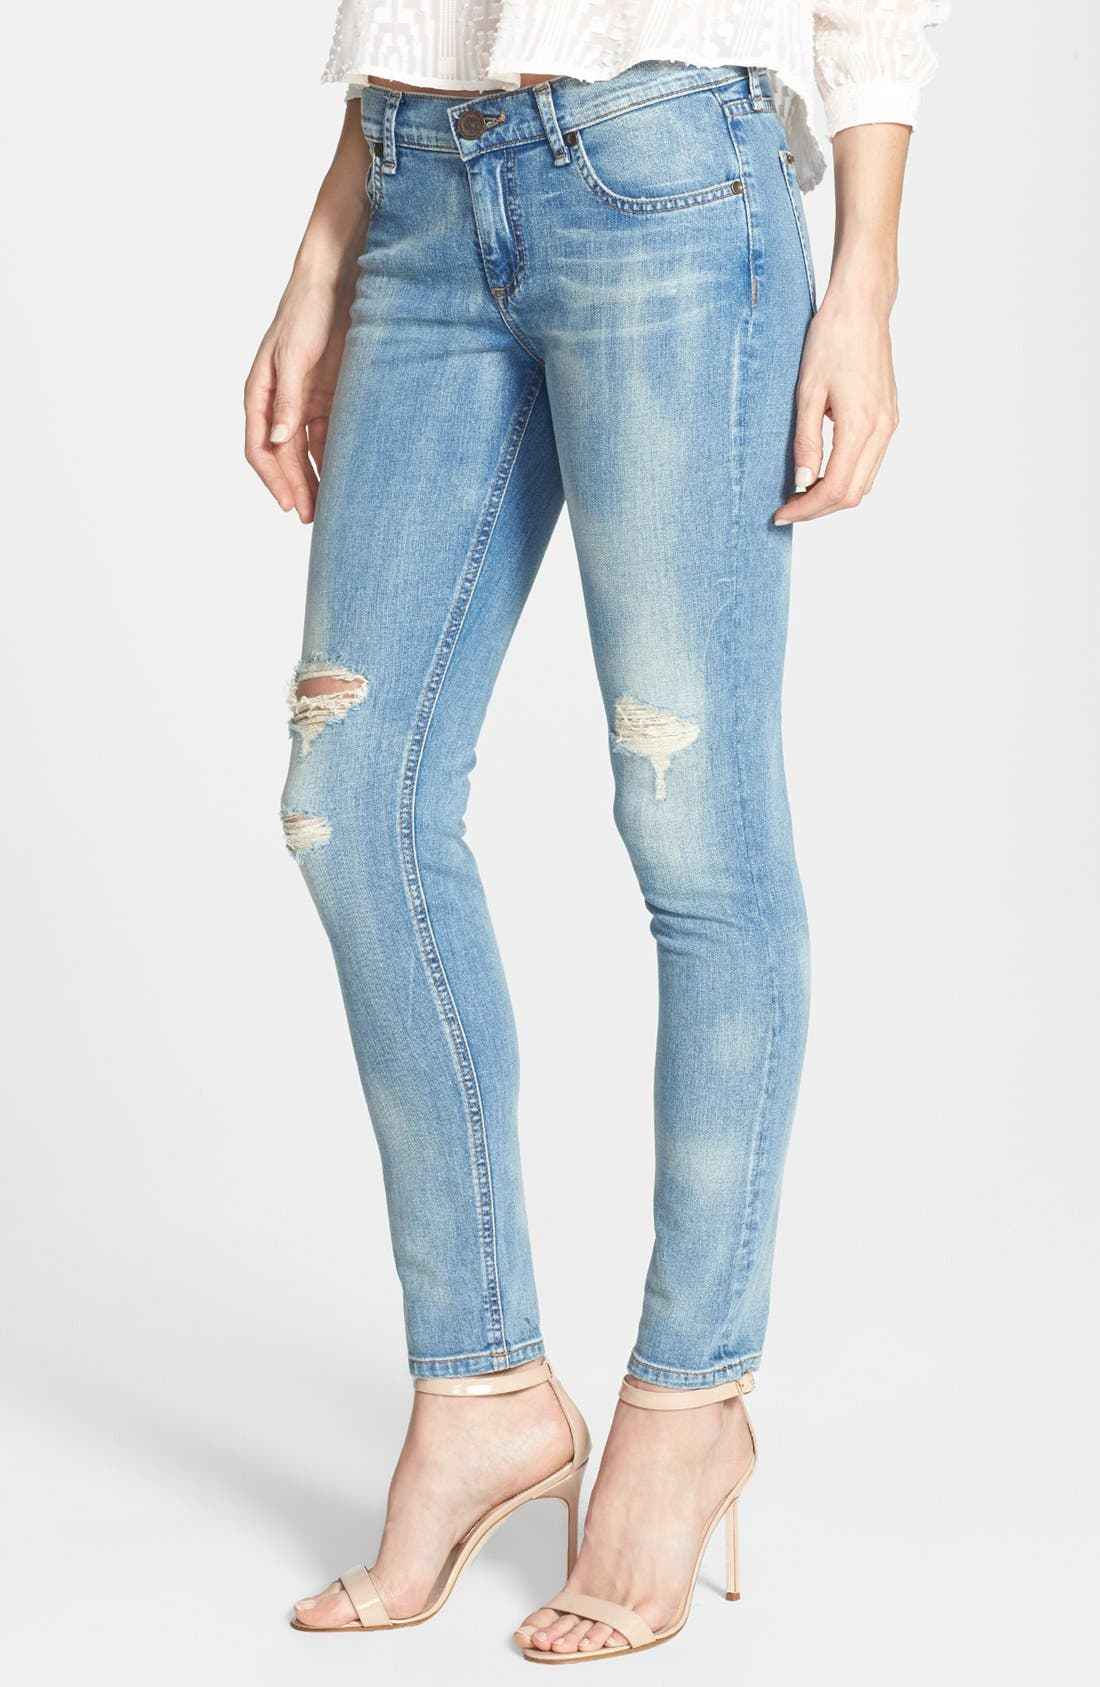 Alternate Image 1 Selected - edyson 'Sloan' Destroyed Skinny Jeans (Marmi)